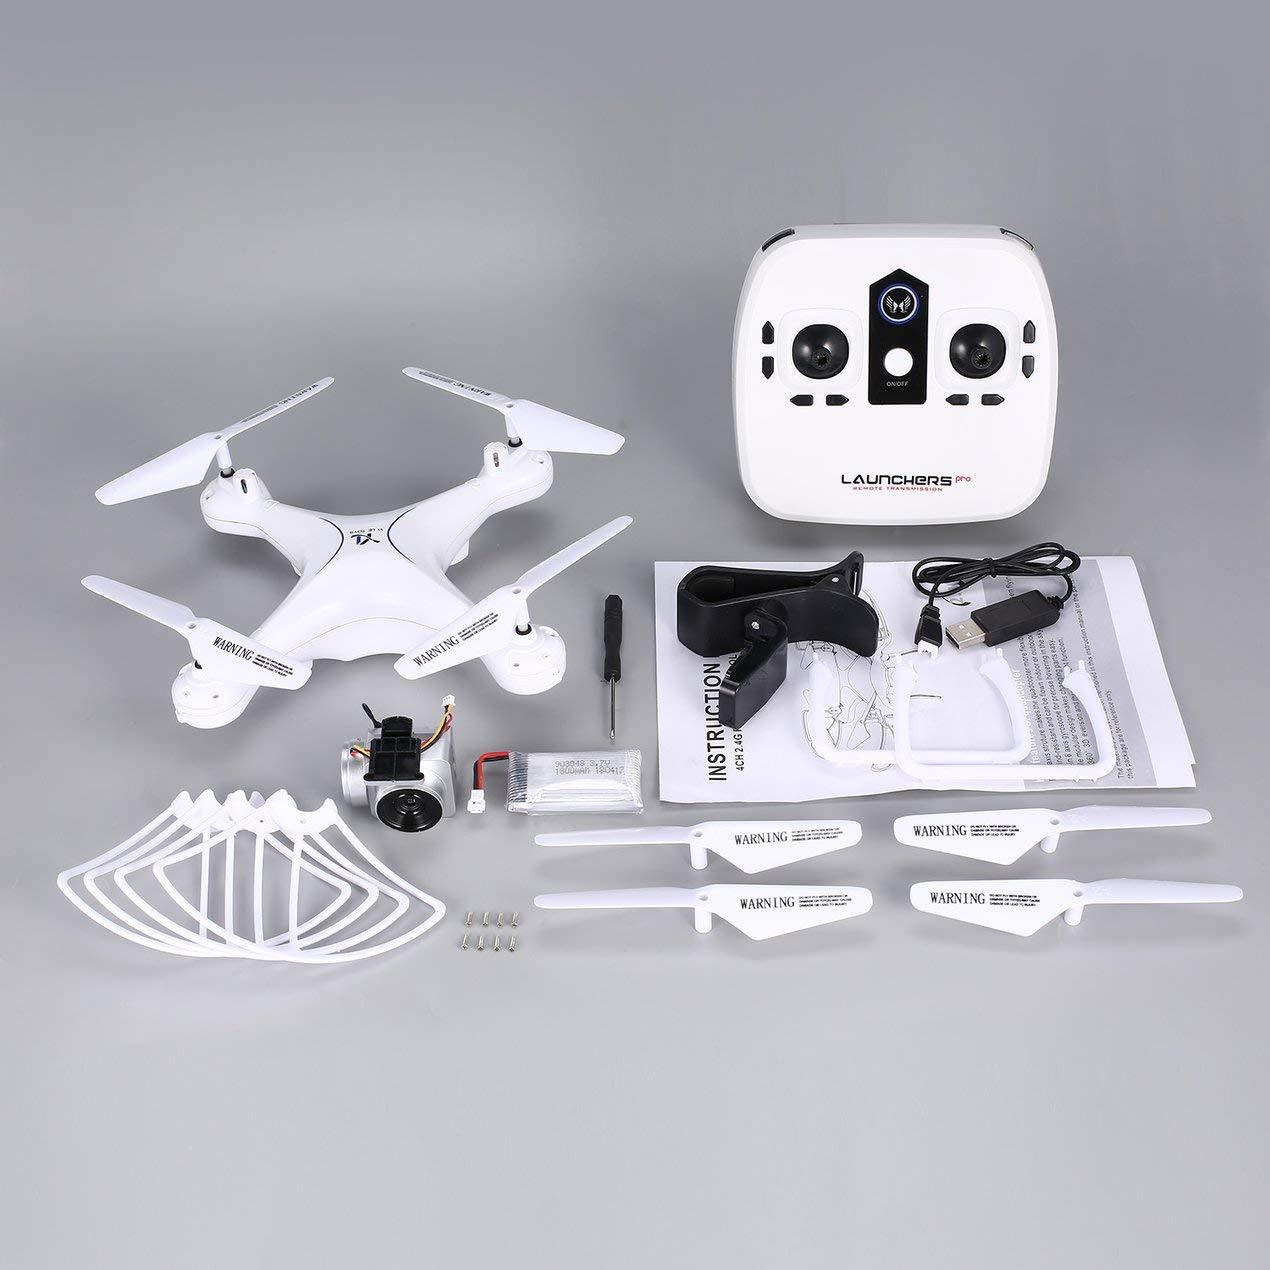 Dooret RC Drone Quadcopter, 2.4G 1080P HD WI Fi Kamera Selfie Quadcopter Flugzeuge mit Höhe Halten Kopflos Mode 3D Flip, weiß